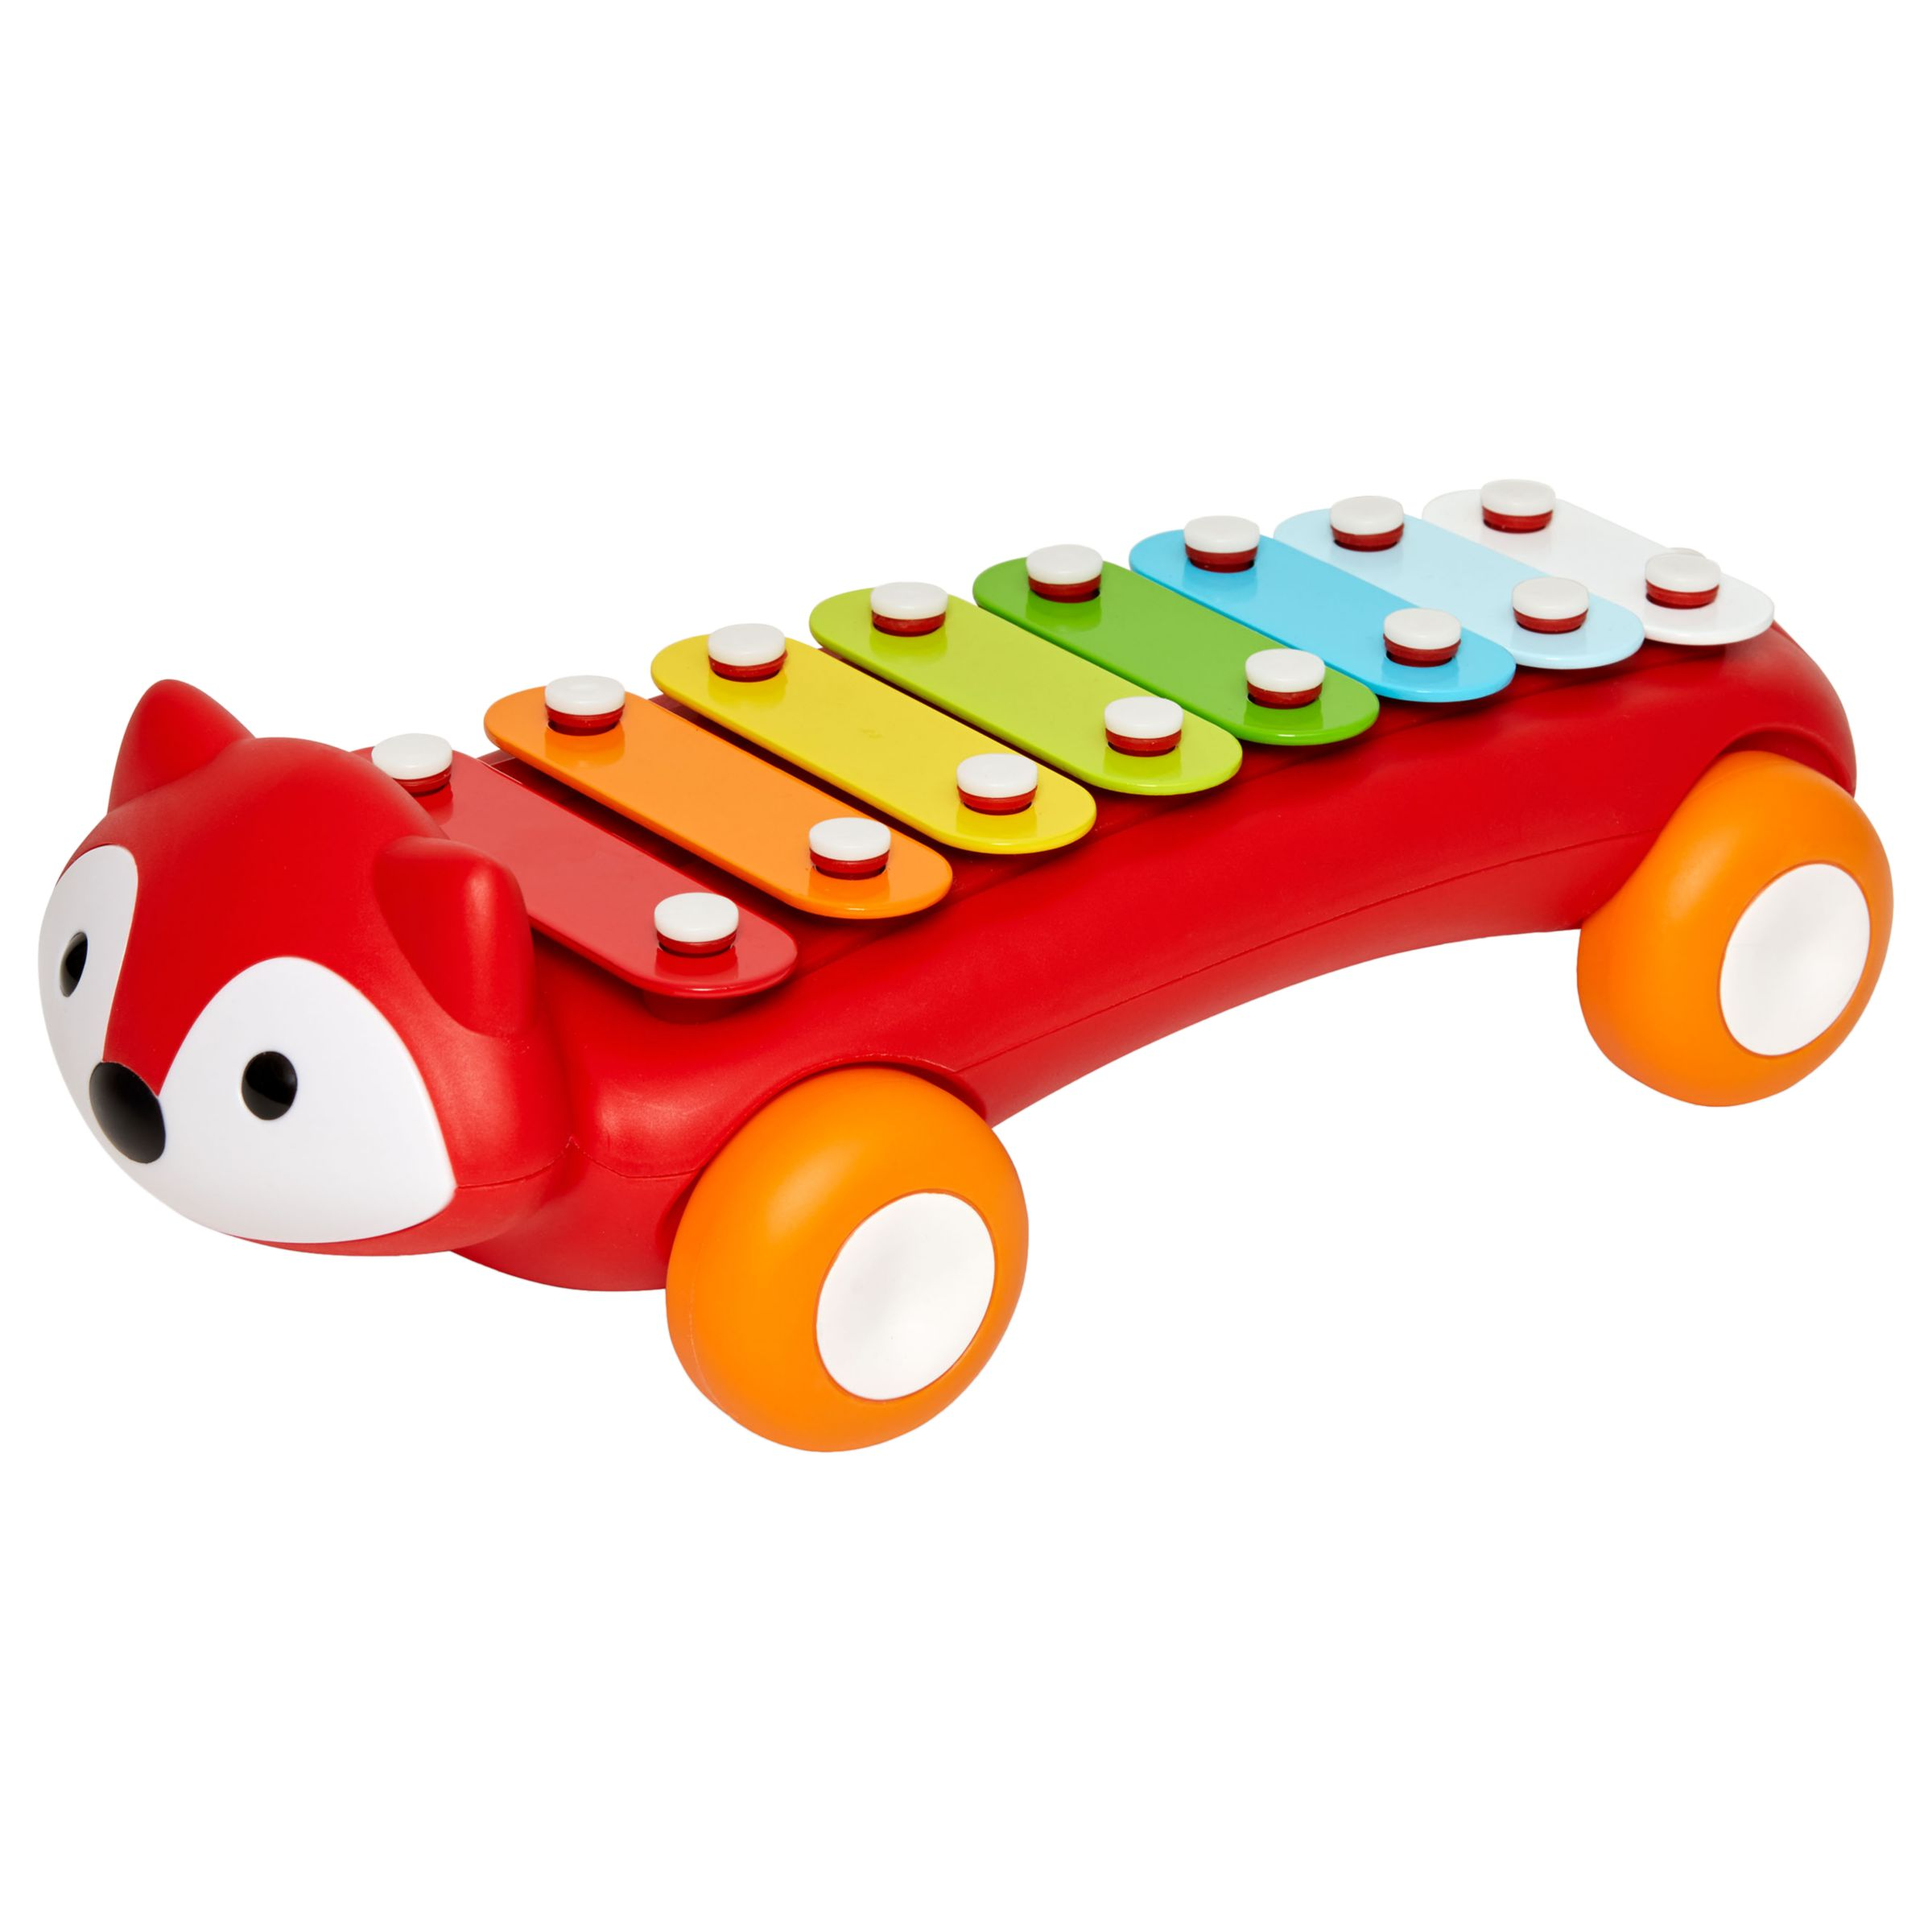 Skip Hop Skip Hop Explore & More Fox Xylophone Toy